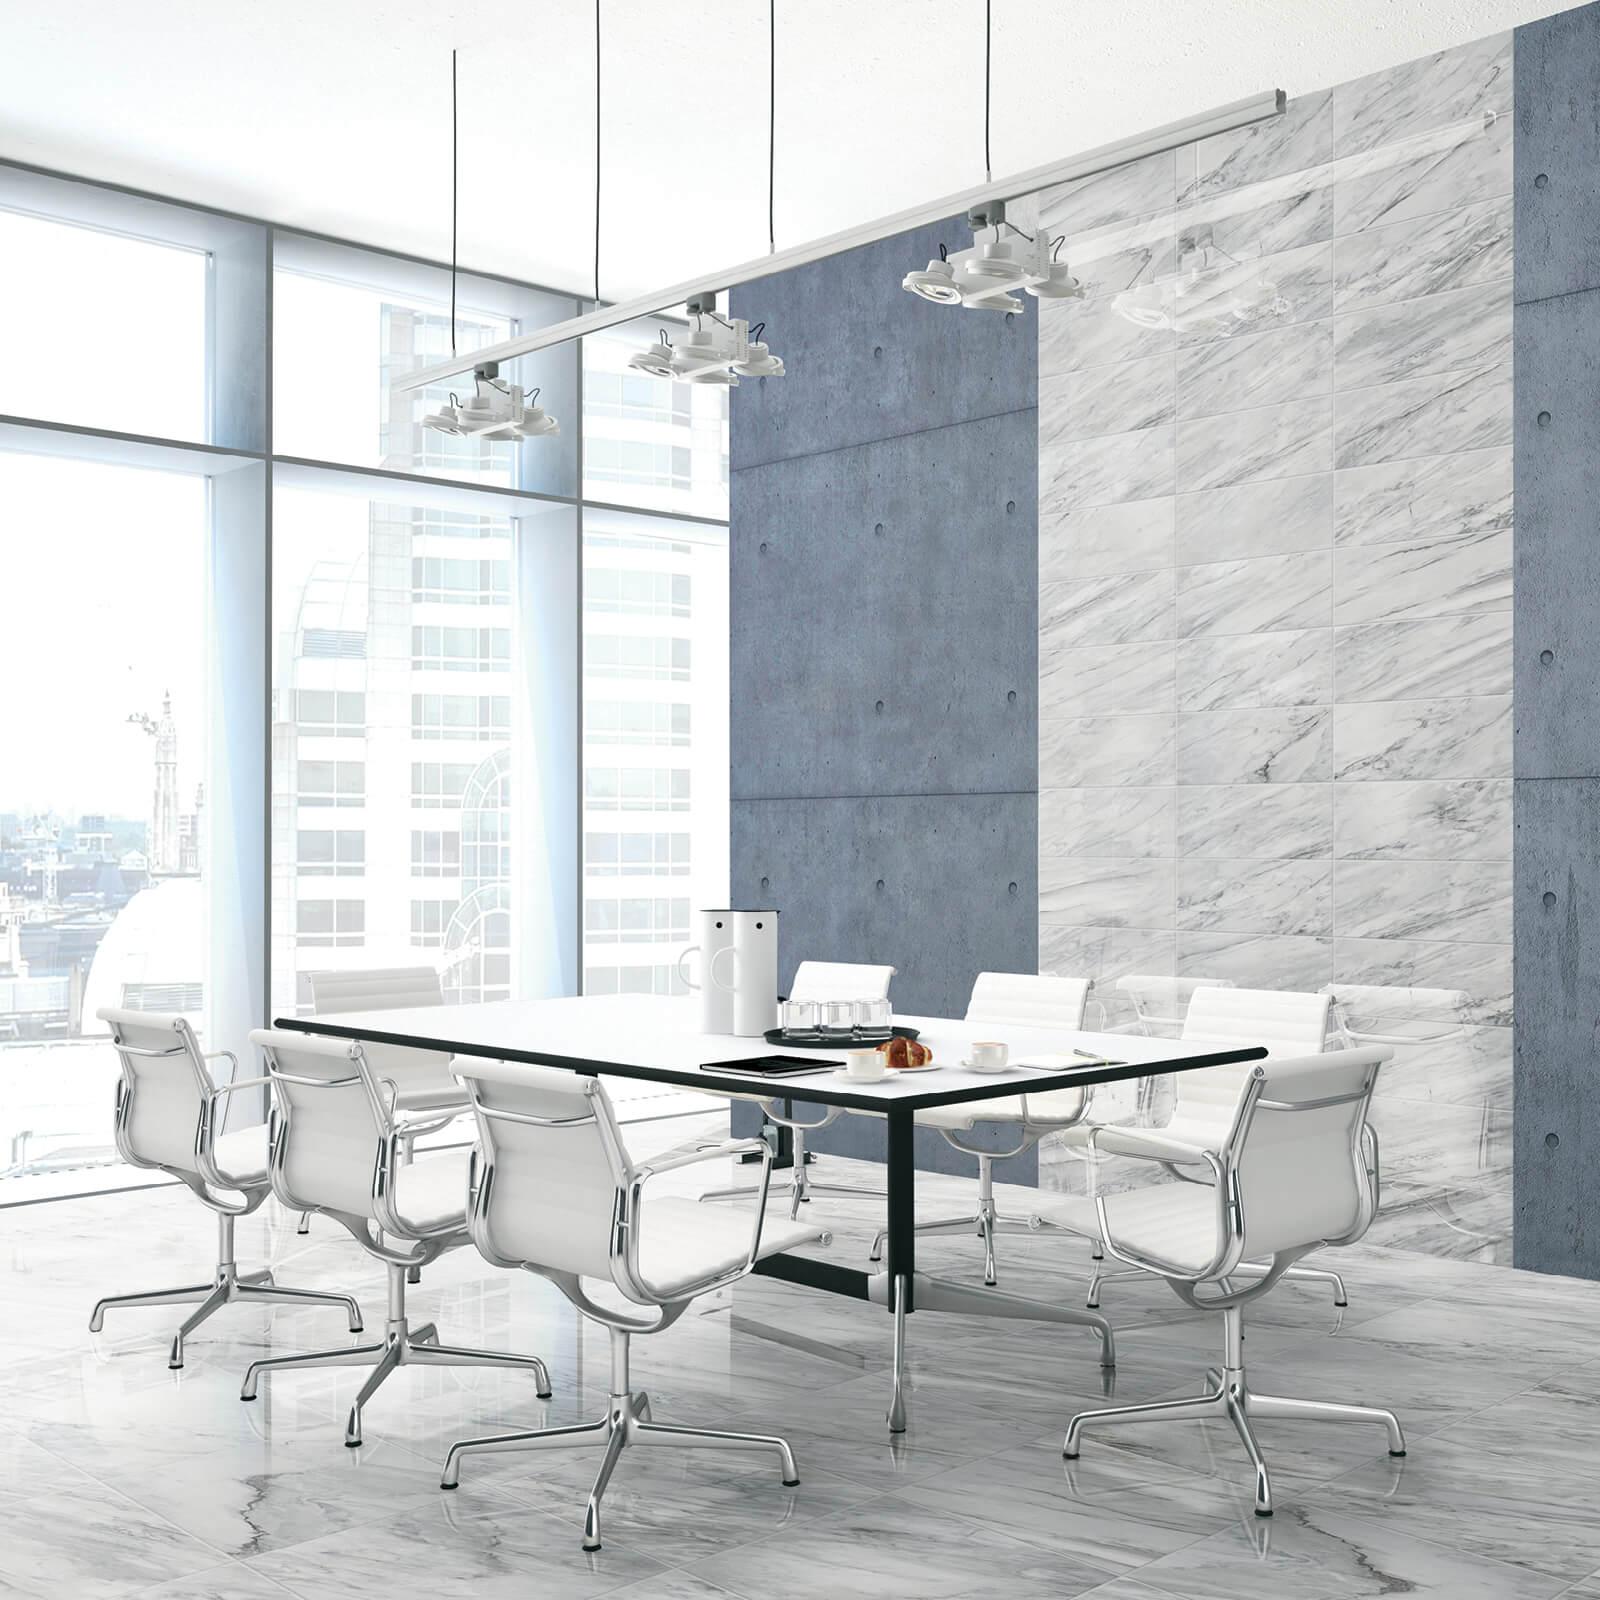 Interior design | Dolphin Carpet & Tile